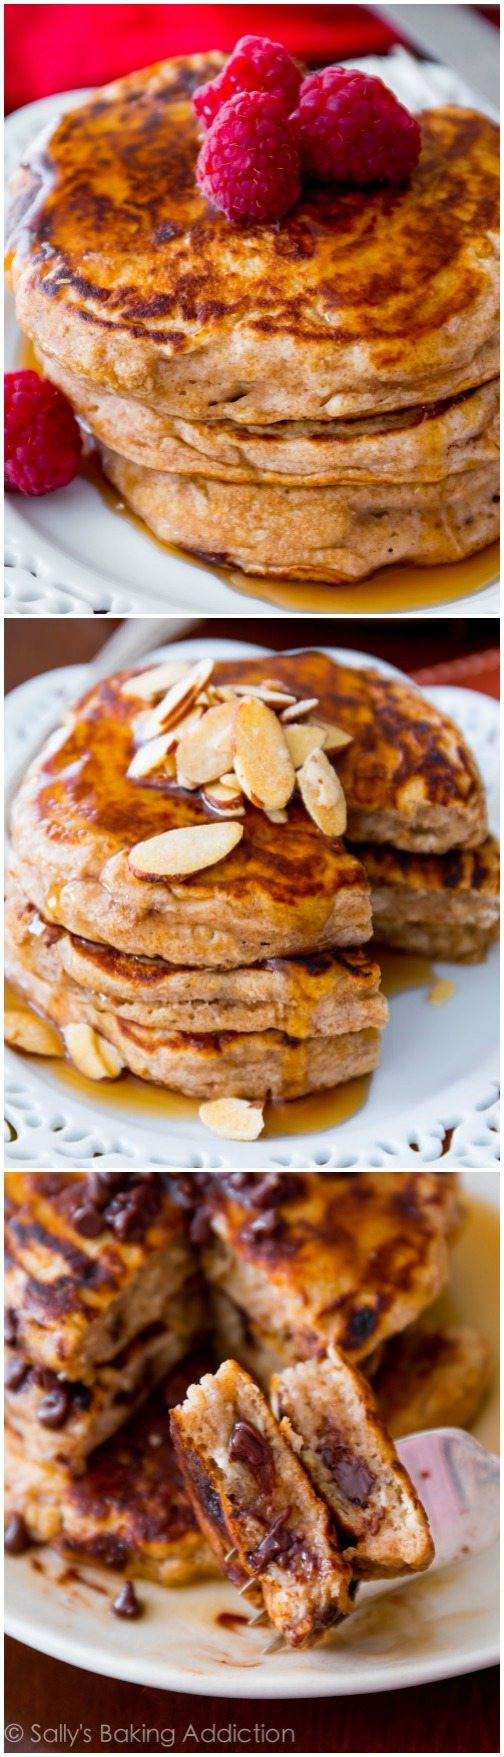 Oatmeal Pancakes Healthy  Whole Wheat Oatmeal Pancakes Sallys Baking Addiction